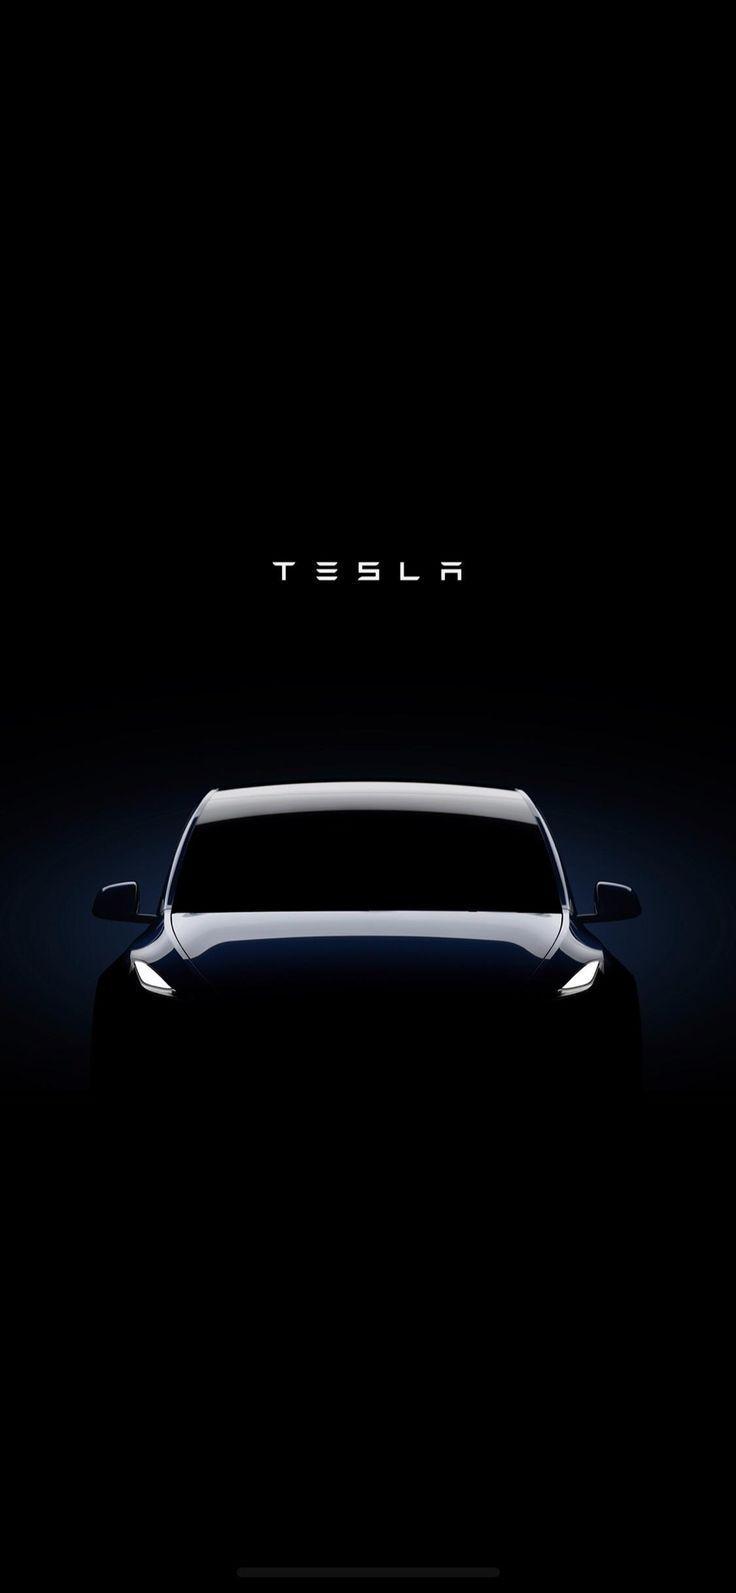 Iphonexwallpaperfullhd Iphonexwallpaperhd1080p Iphonexwallpaperhd4k Iphonexwallpaperhddownload Iphonexwallpaperli Tesla Car Tesla Car Iphone Wallpaper